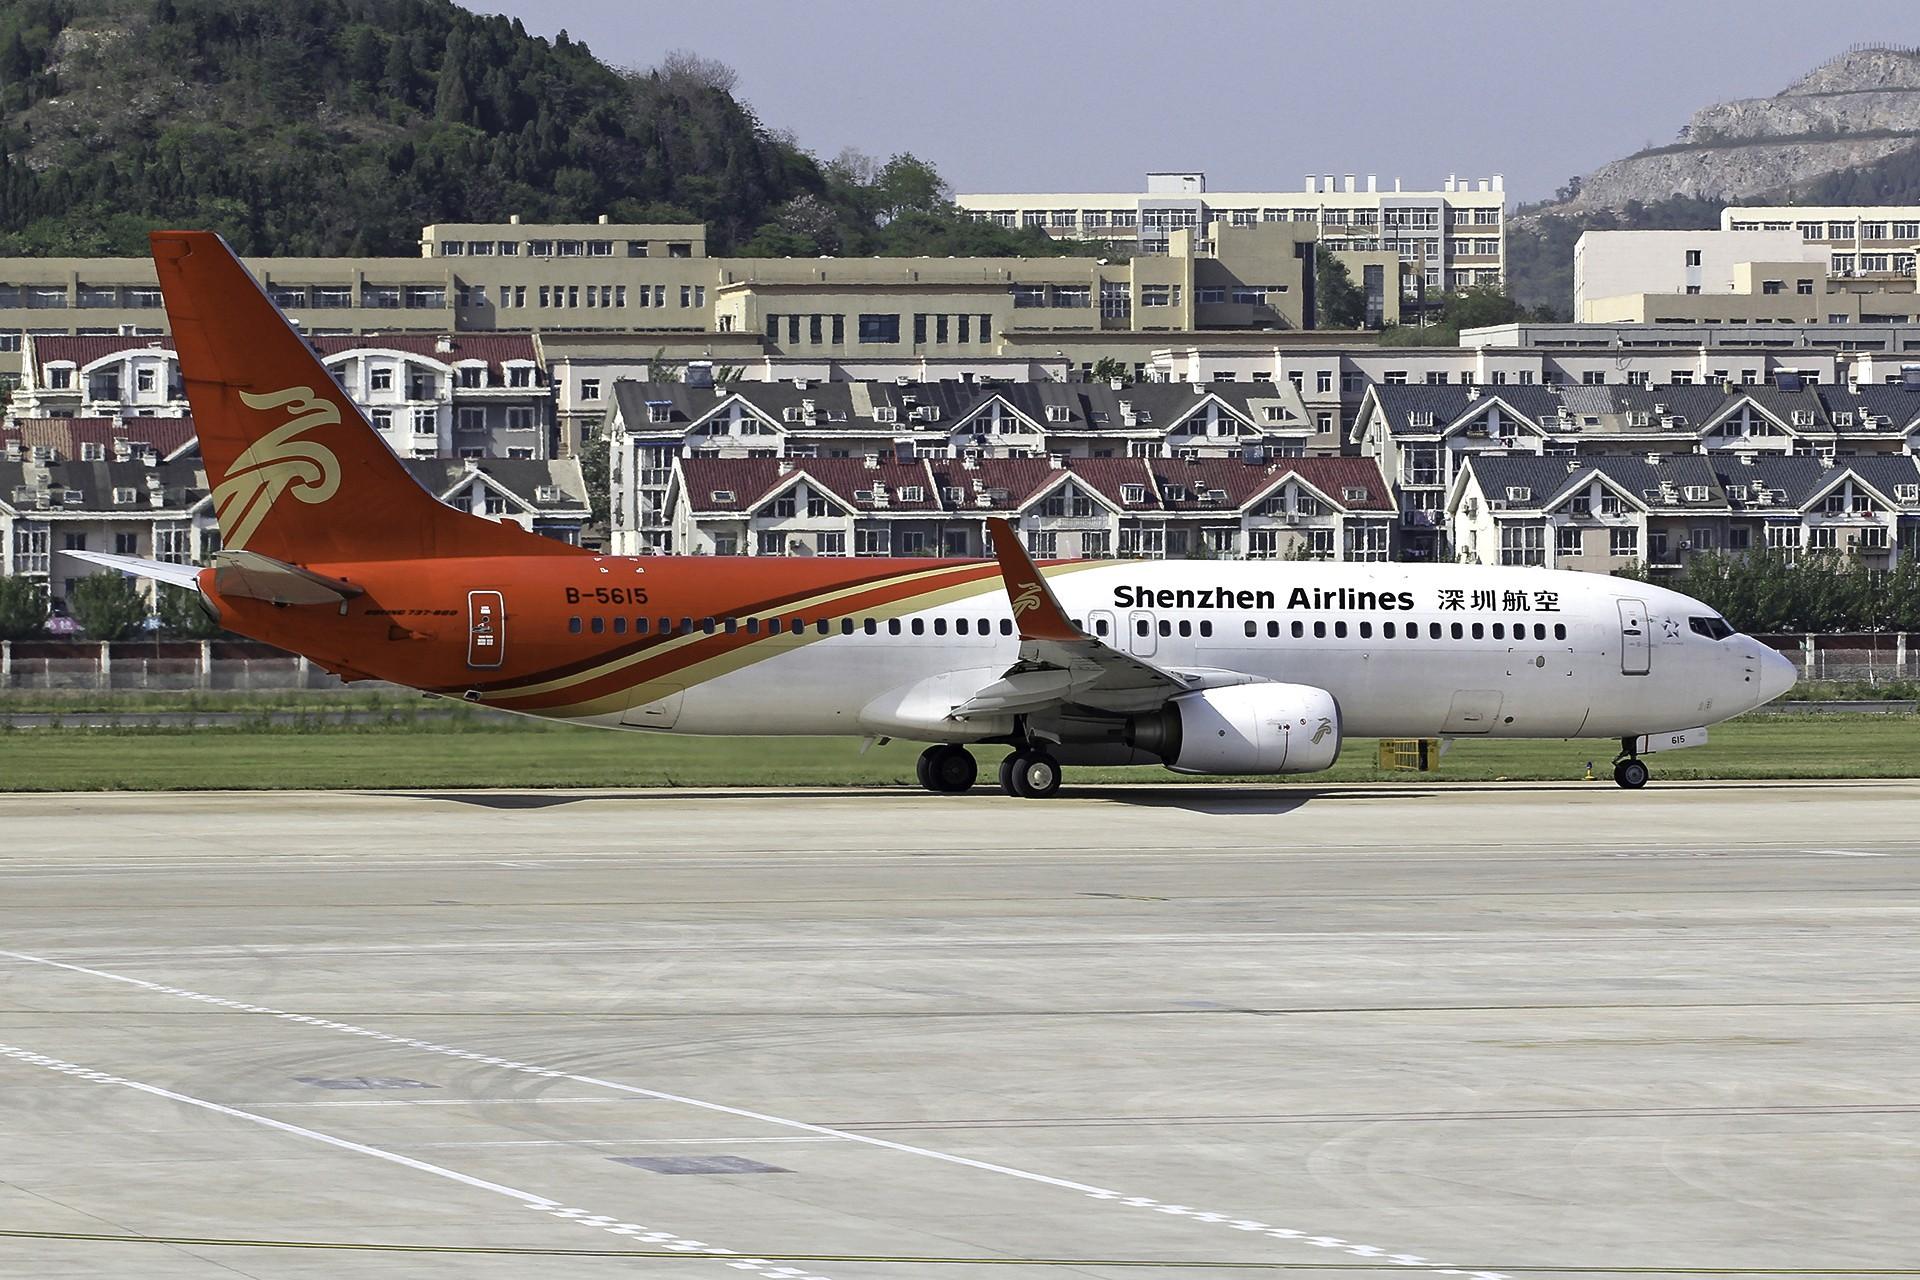 Re:[原创][DLC]滨海大连,浪漫之都….1920x1280pix 连载中 BOEING 737-800 B-5615 中国大连周水子国际机场